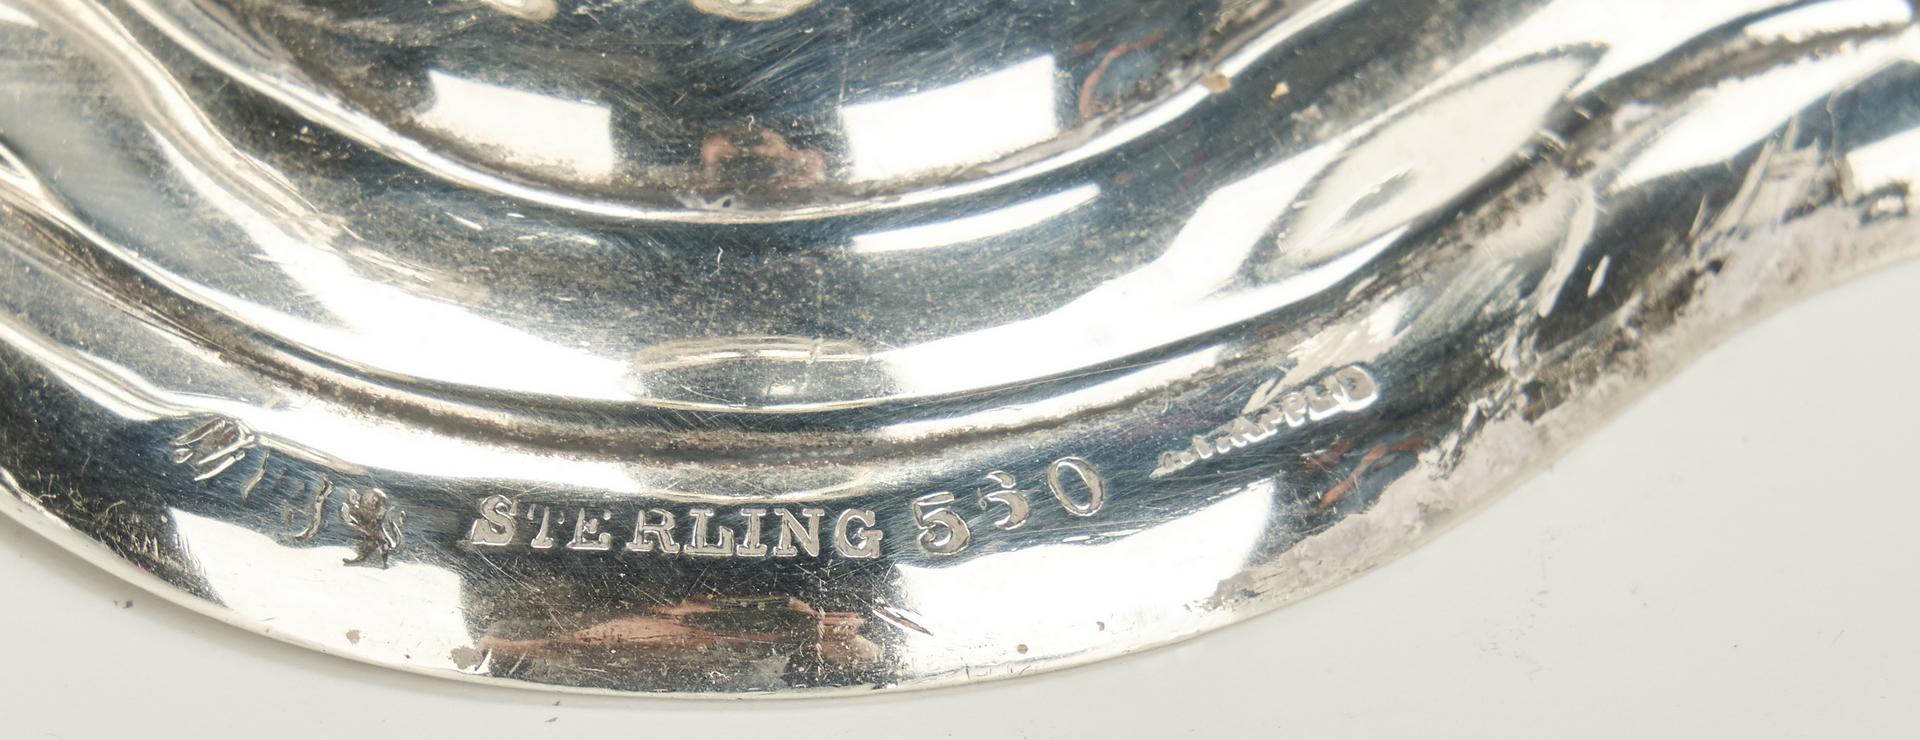 Lot 1031: Meridian Sterling Tray & Bowl, Pr. Reed & Barton Candlesticks, 4 pcs.